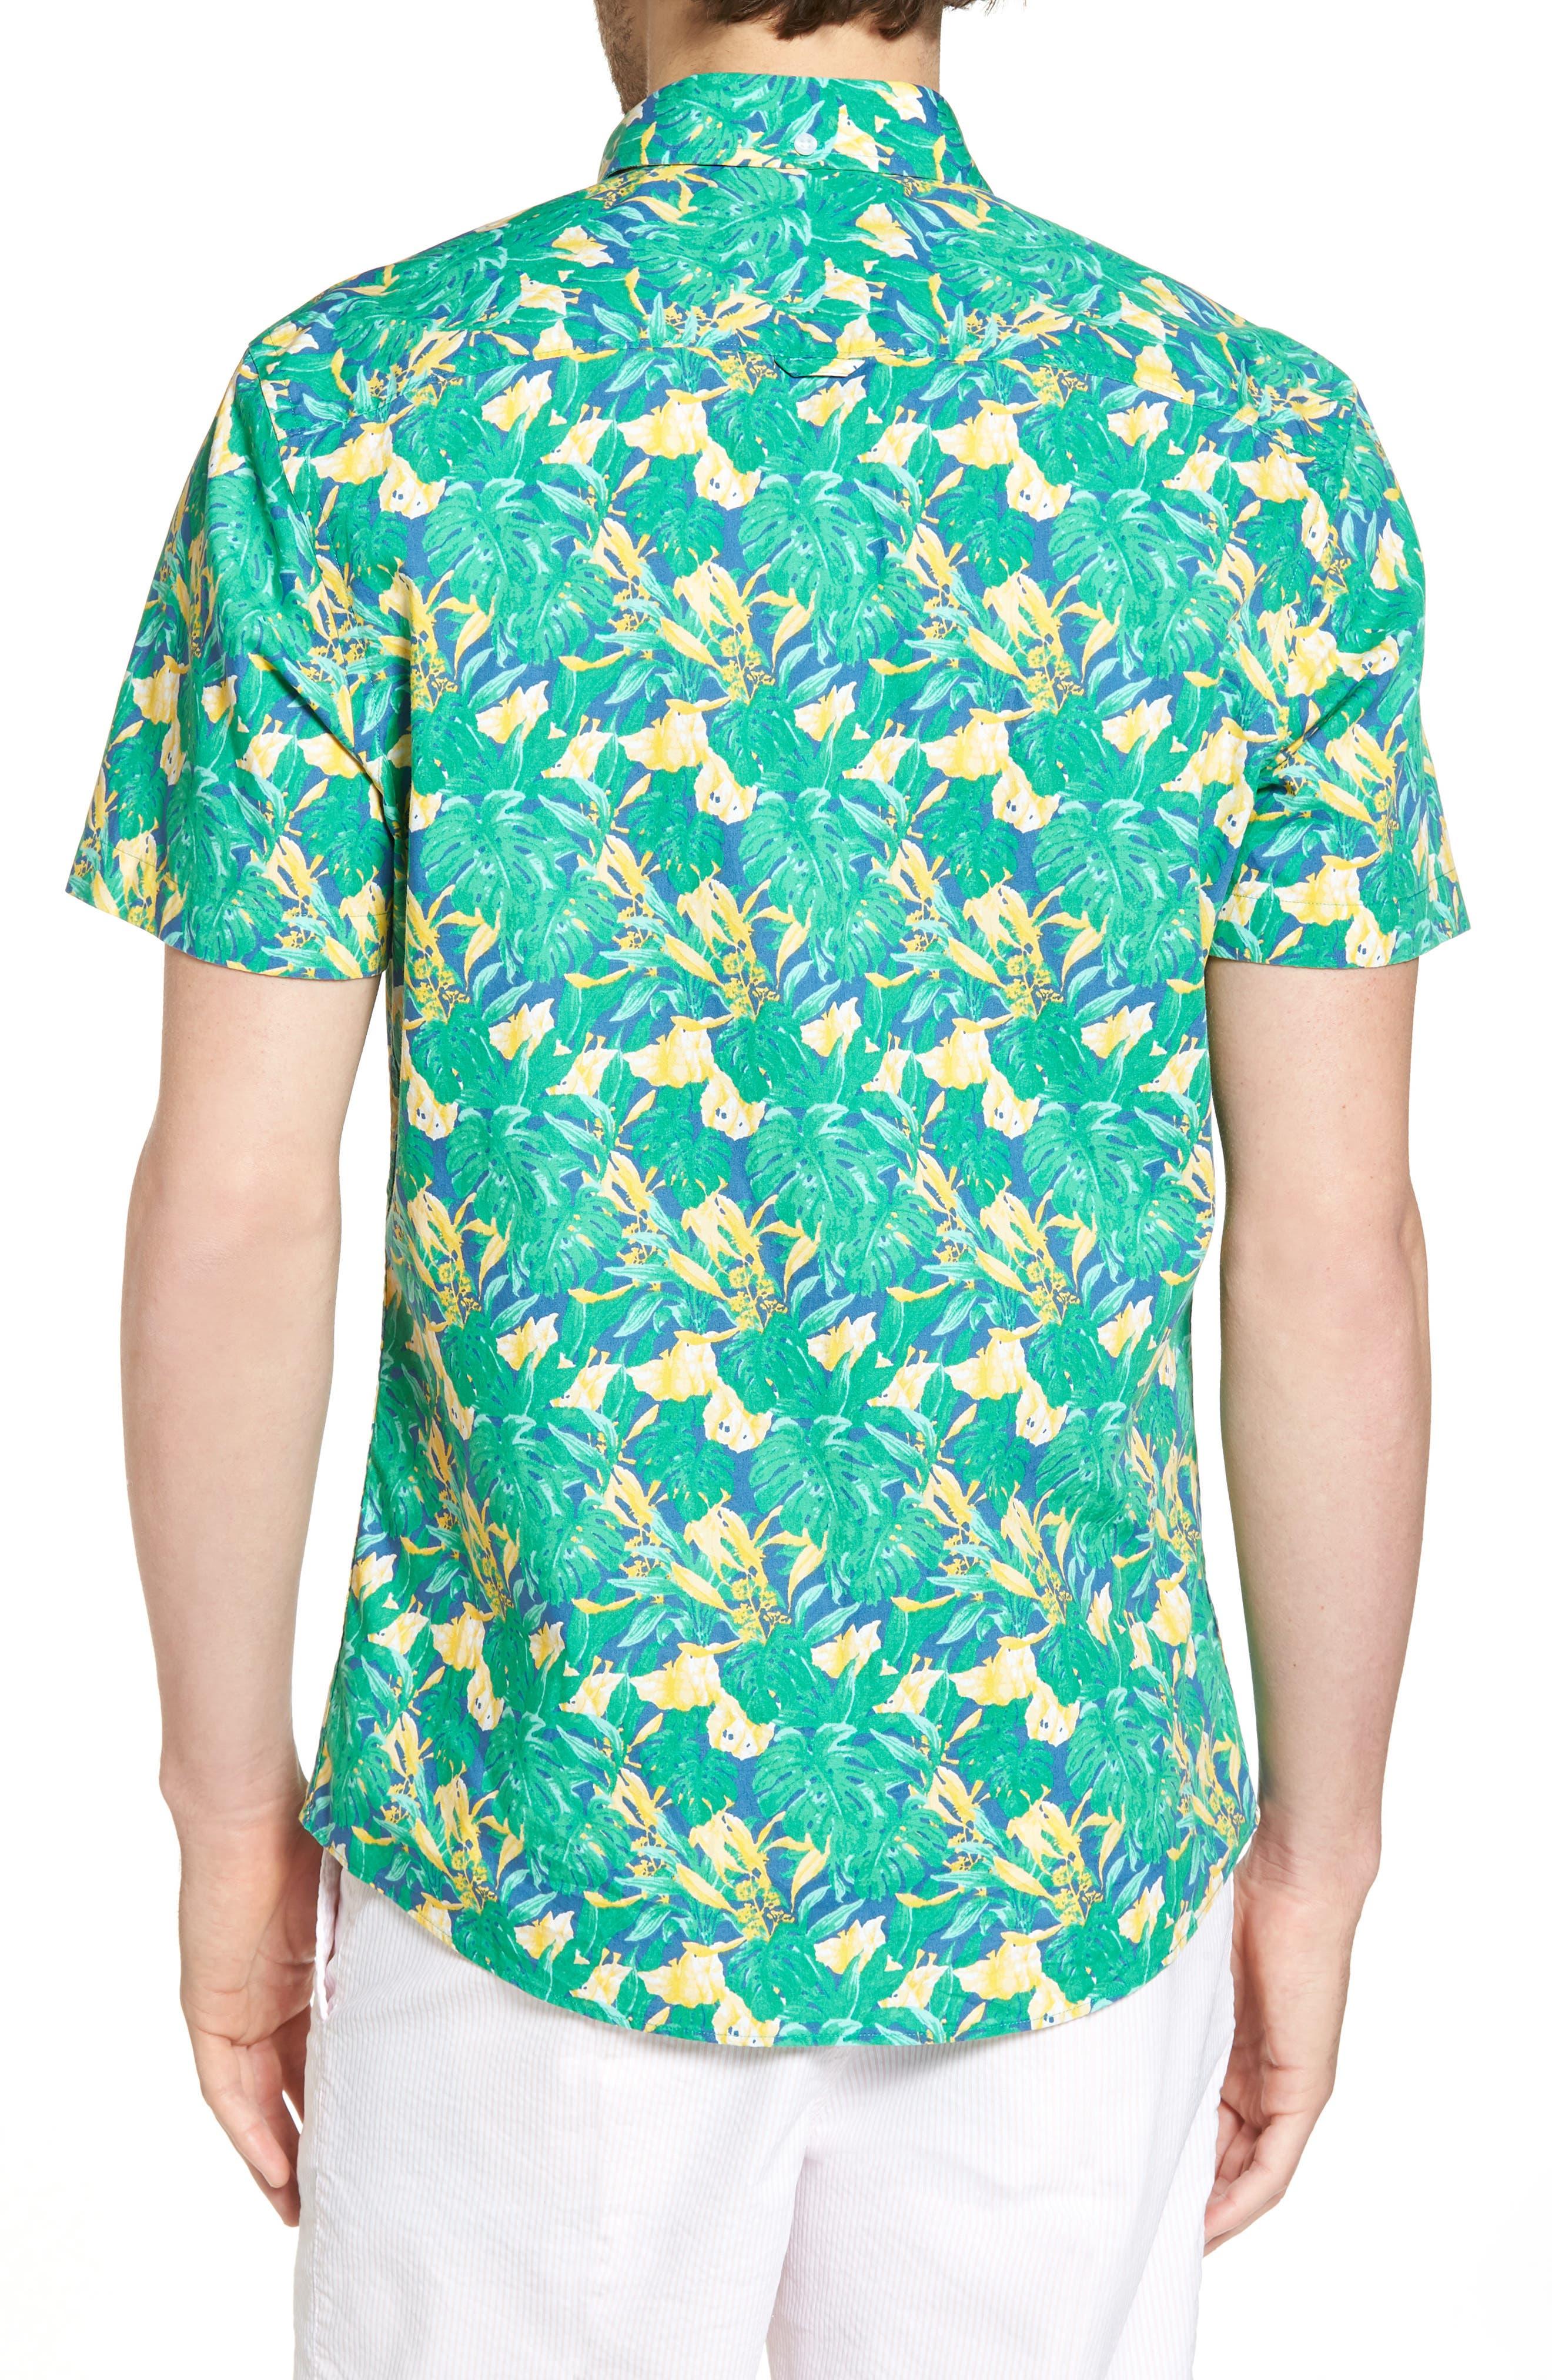 Trim Fit Leaf Print Sport Shirt,                             Alternate thumbnail 3, color,                             Green Yellow Split Leaves